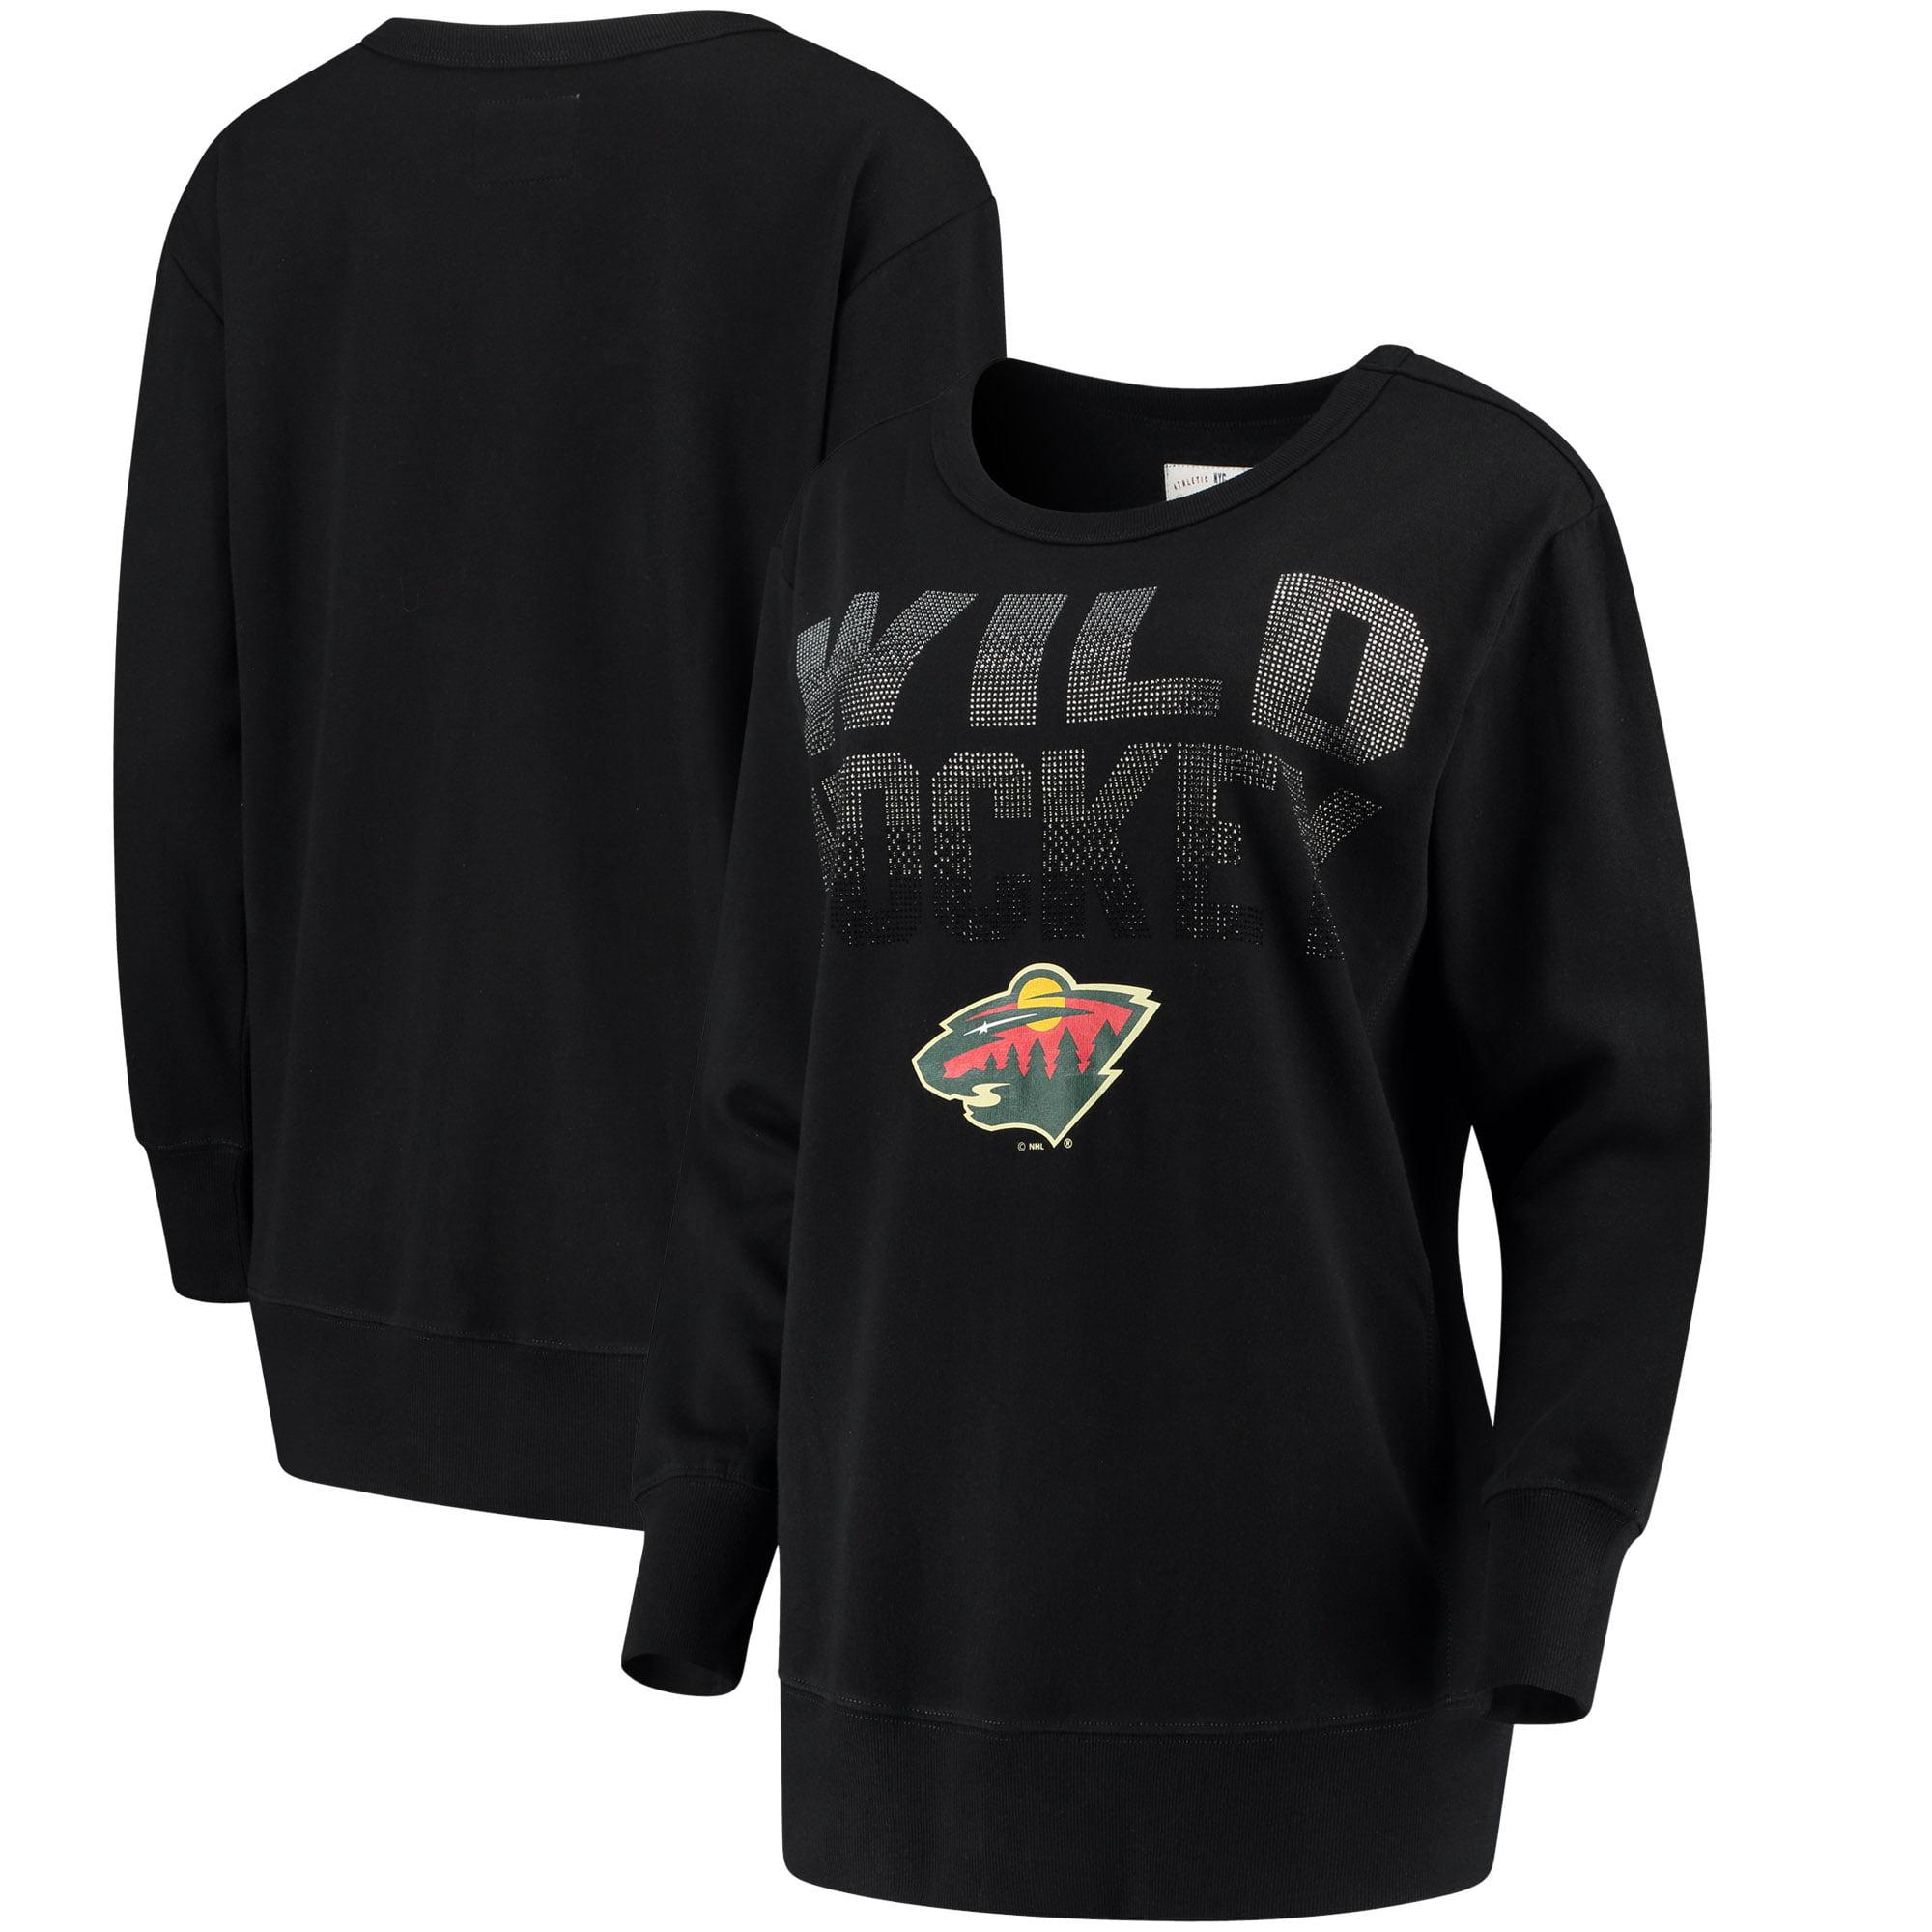 Minnesota Wild G-III 4Her by Carl Banks Women's Showtime Pullover Crewneck Sweatshirt - Black